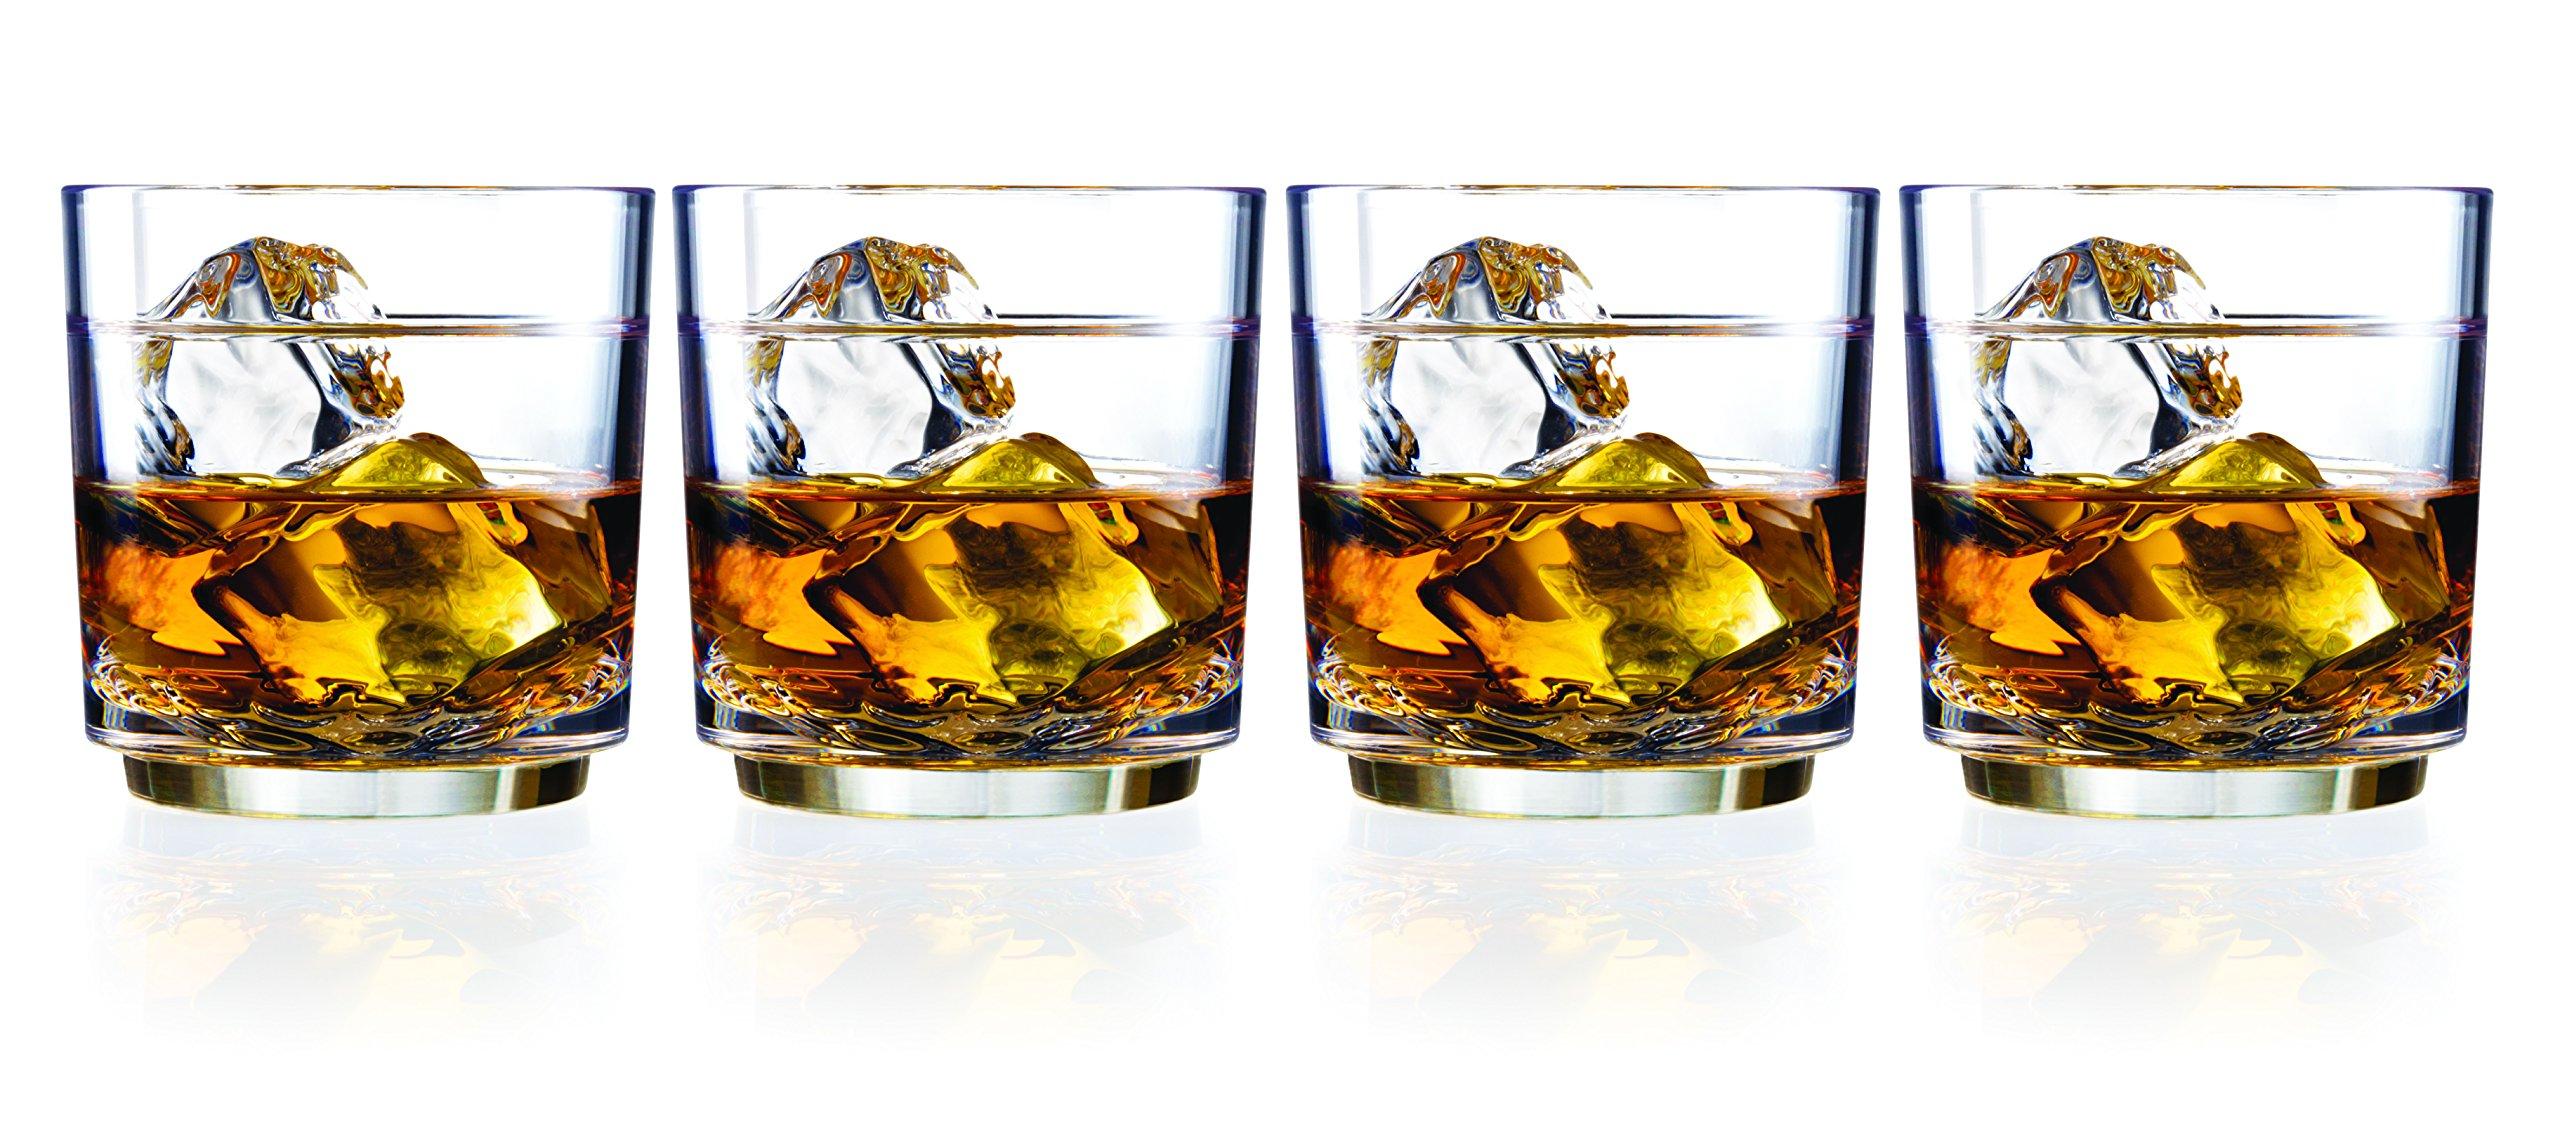 Drinique Elite Rocks Unbreakable Tritan Whiskey Glasses, 10 oz (Set of 4), Clear